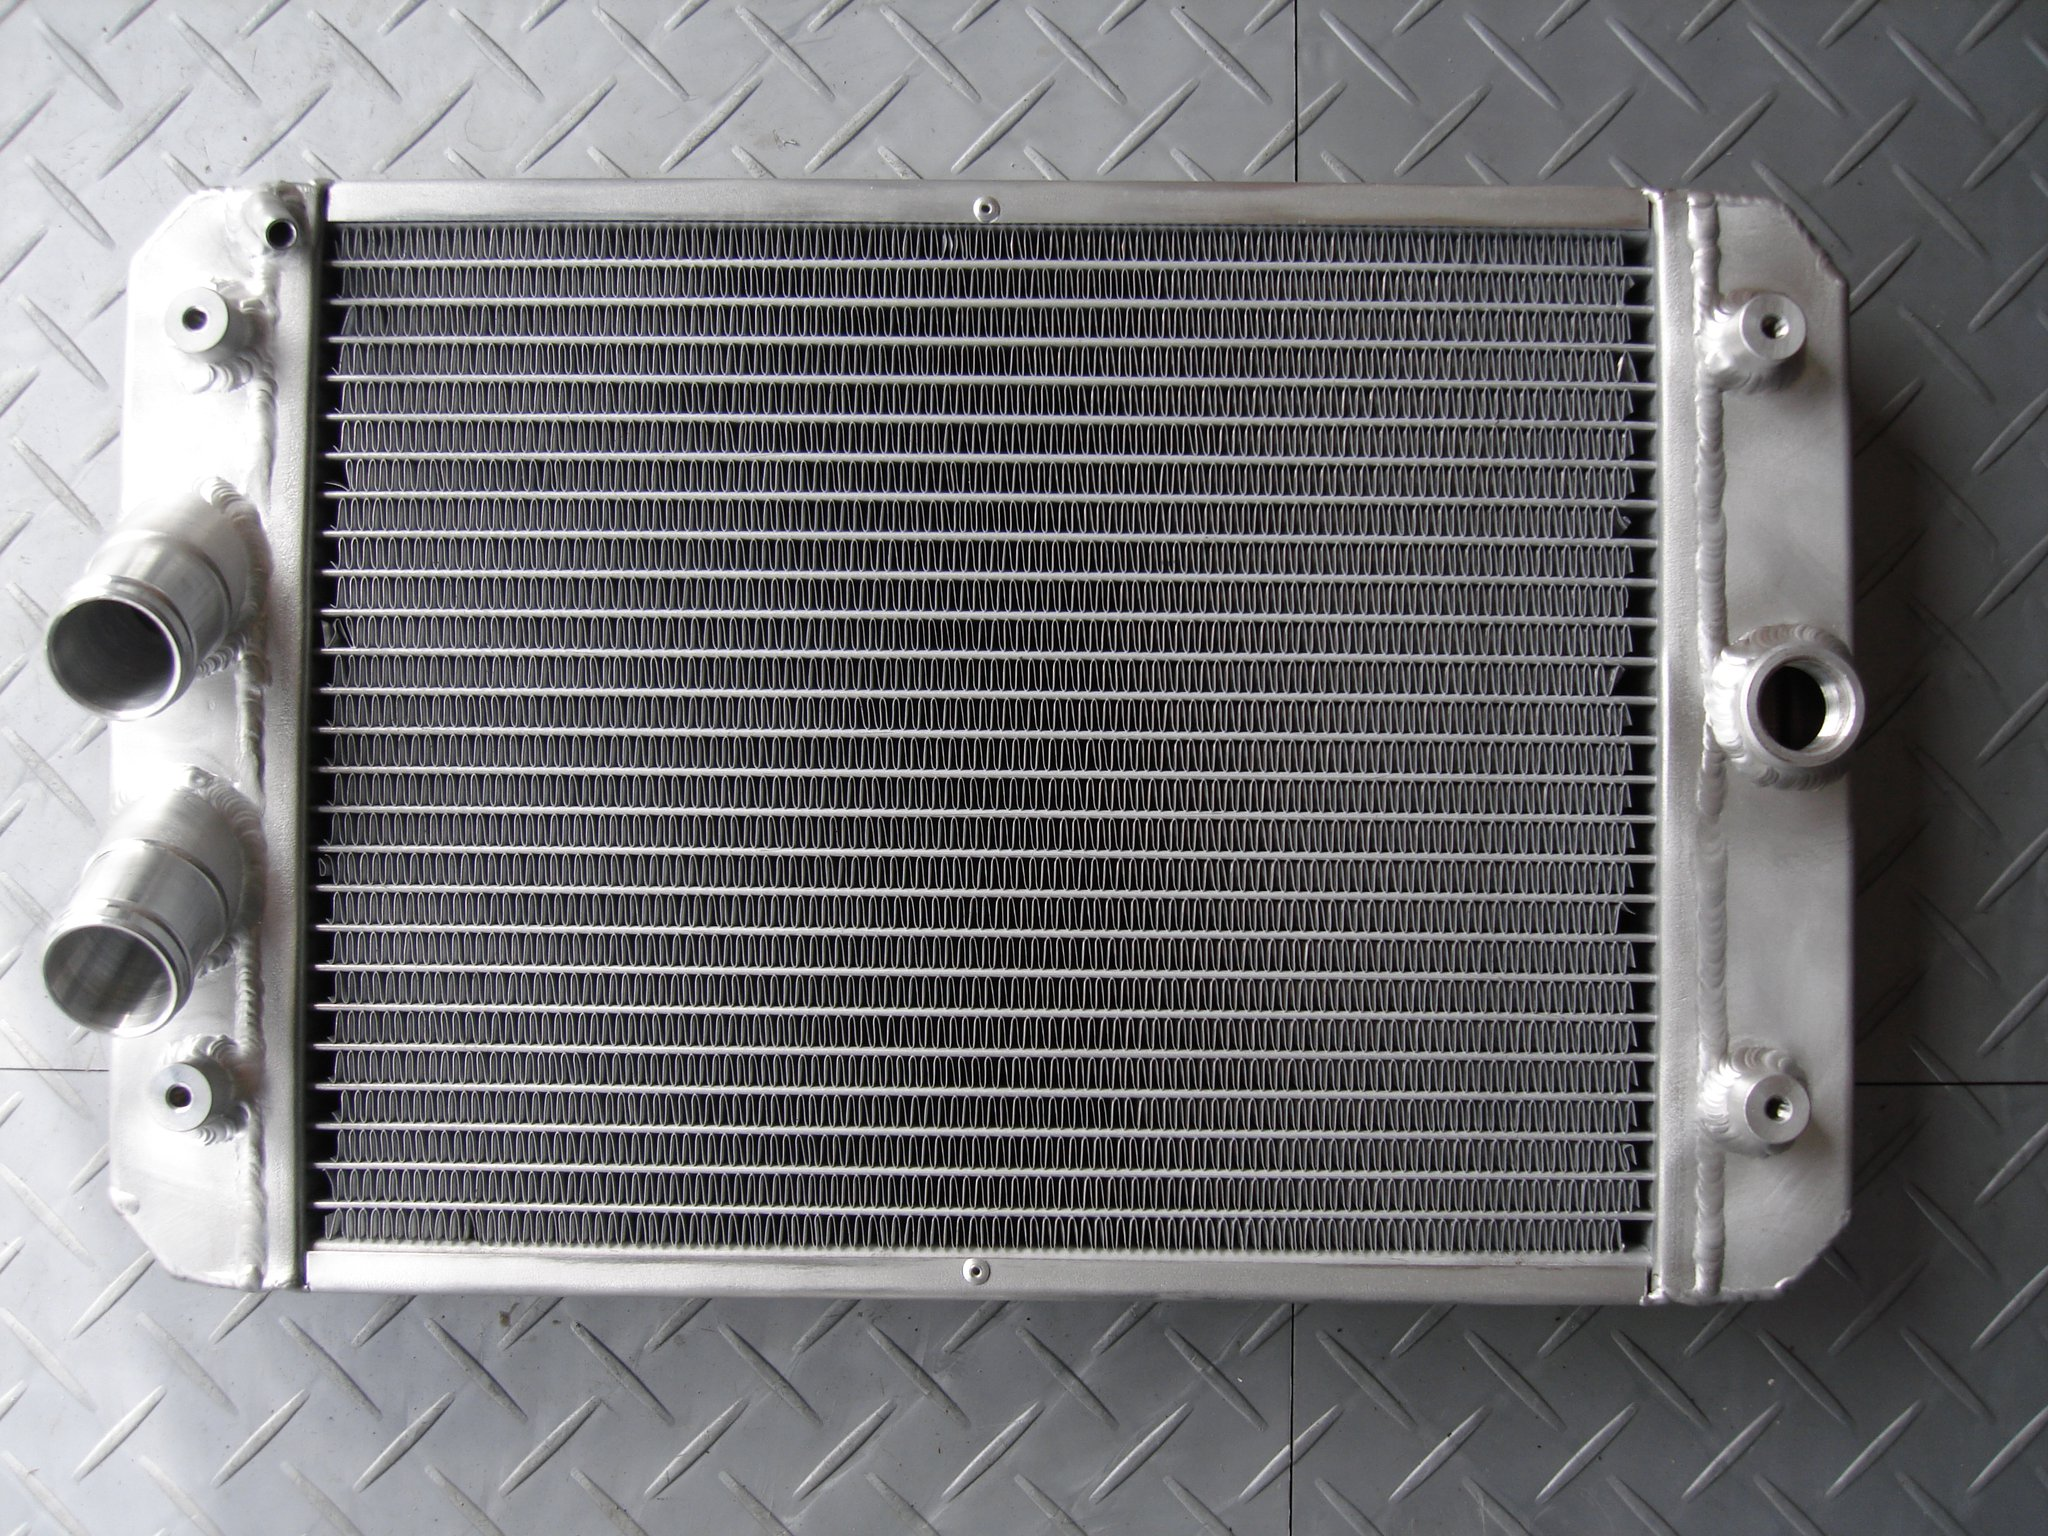 The best aluminum heating radiators: characteristics, tips on choosing, the best manufacturers 16